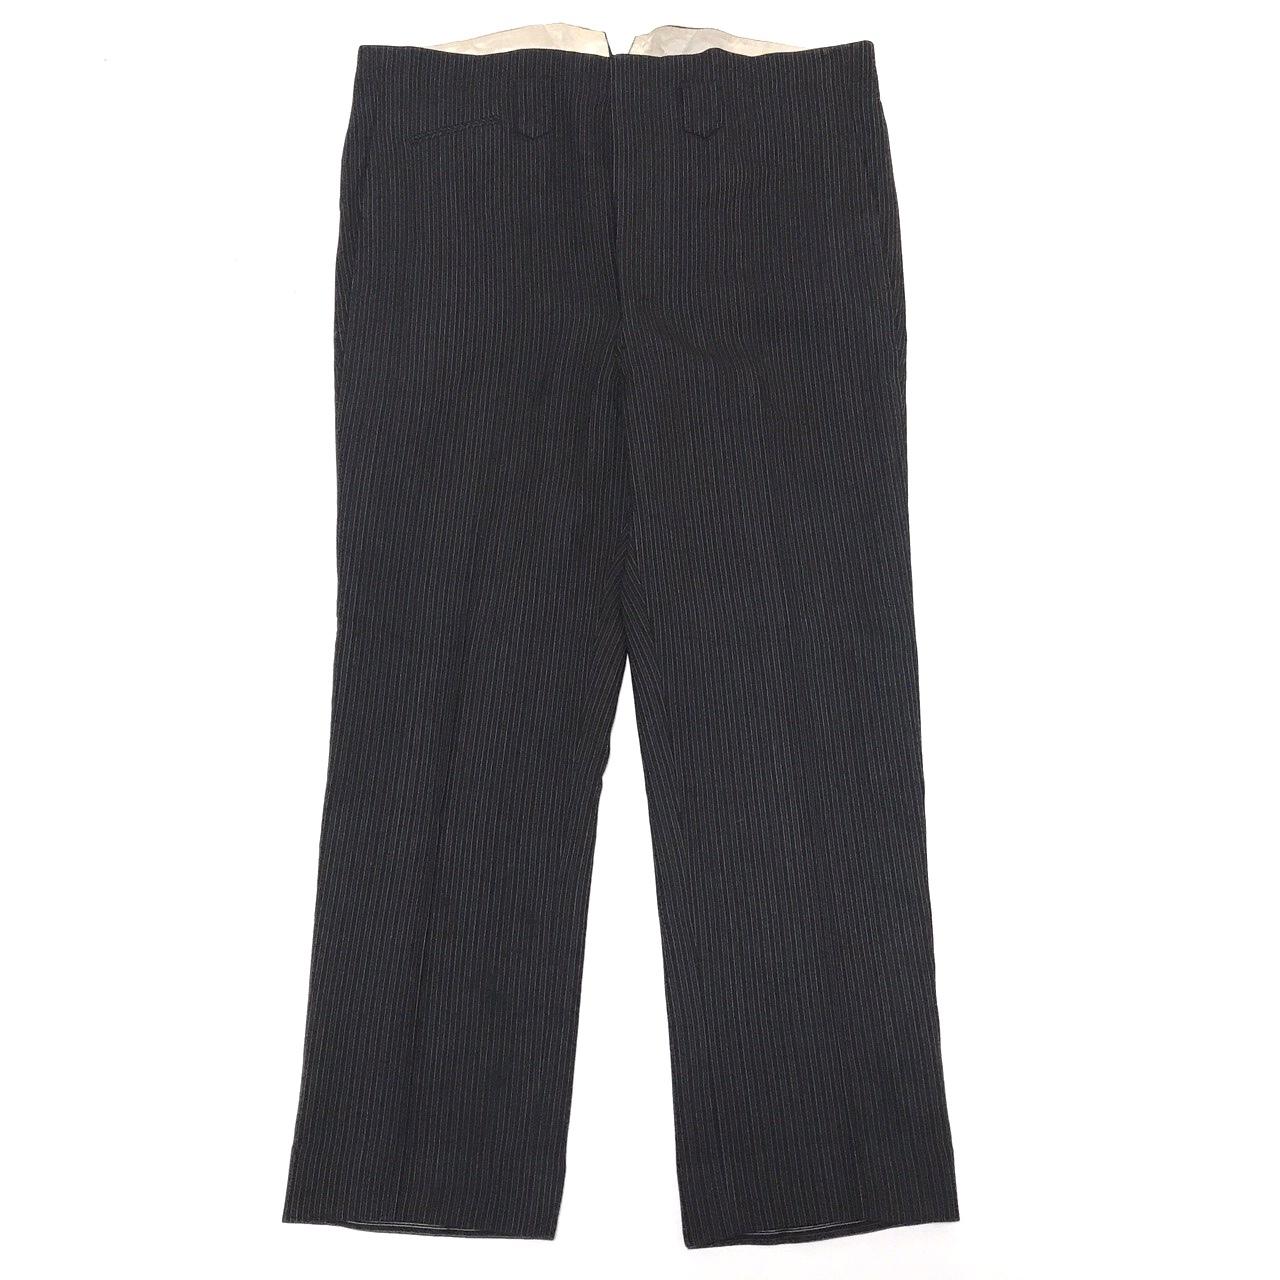 ① Vintage French Work Trousers Black Stripe